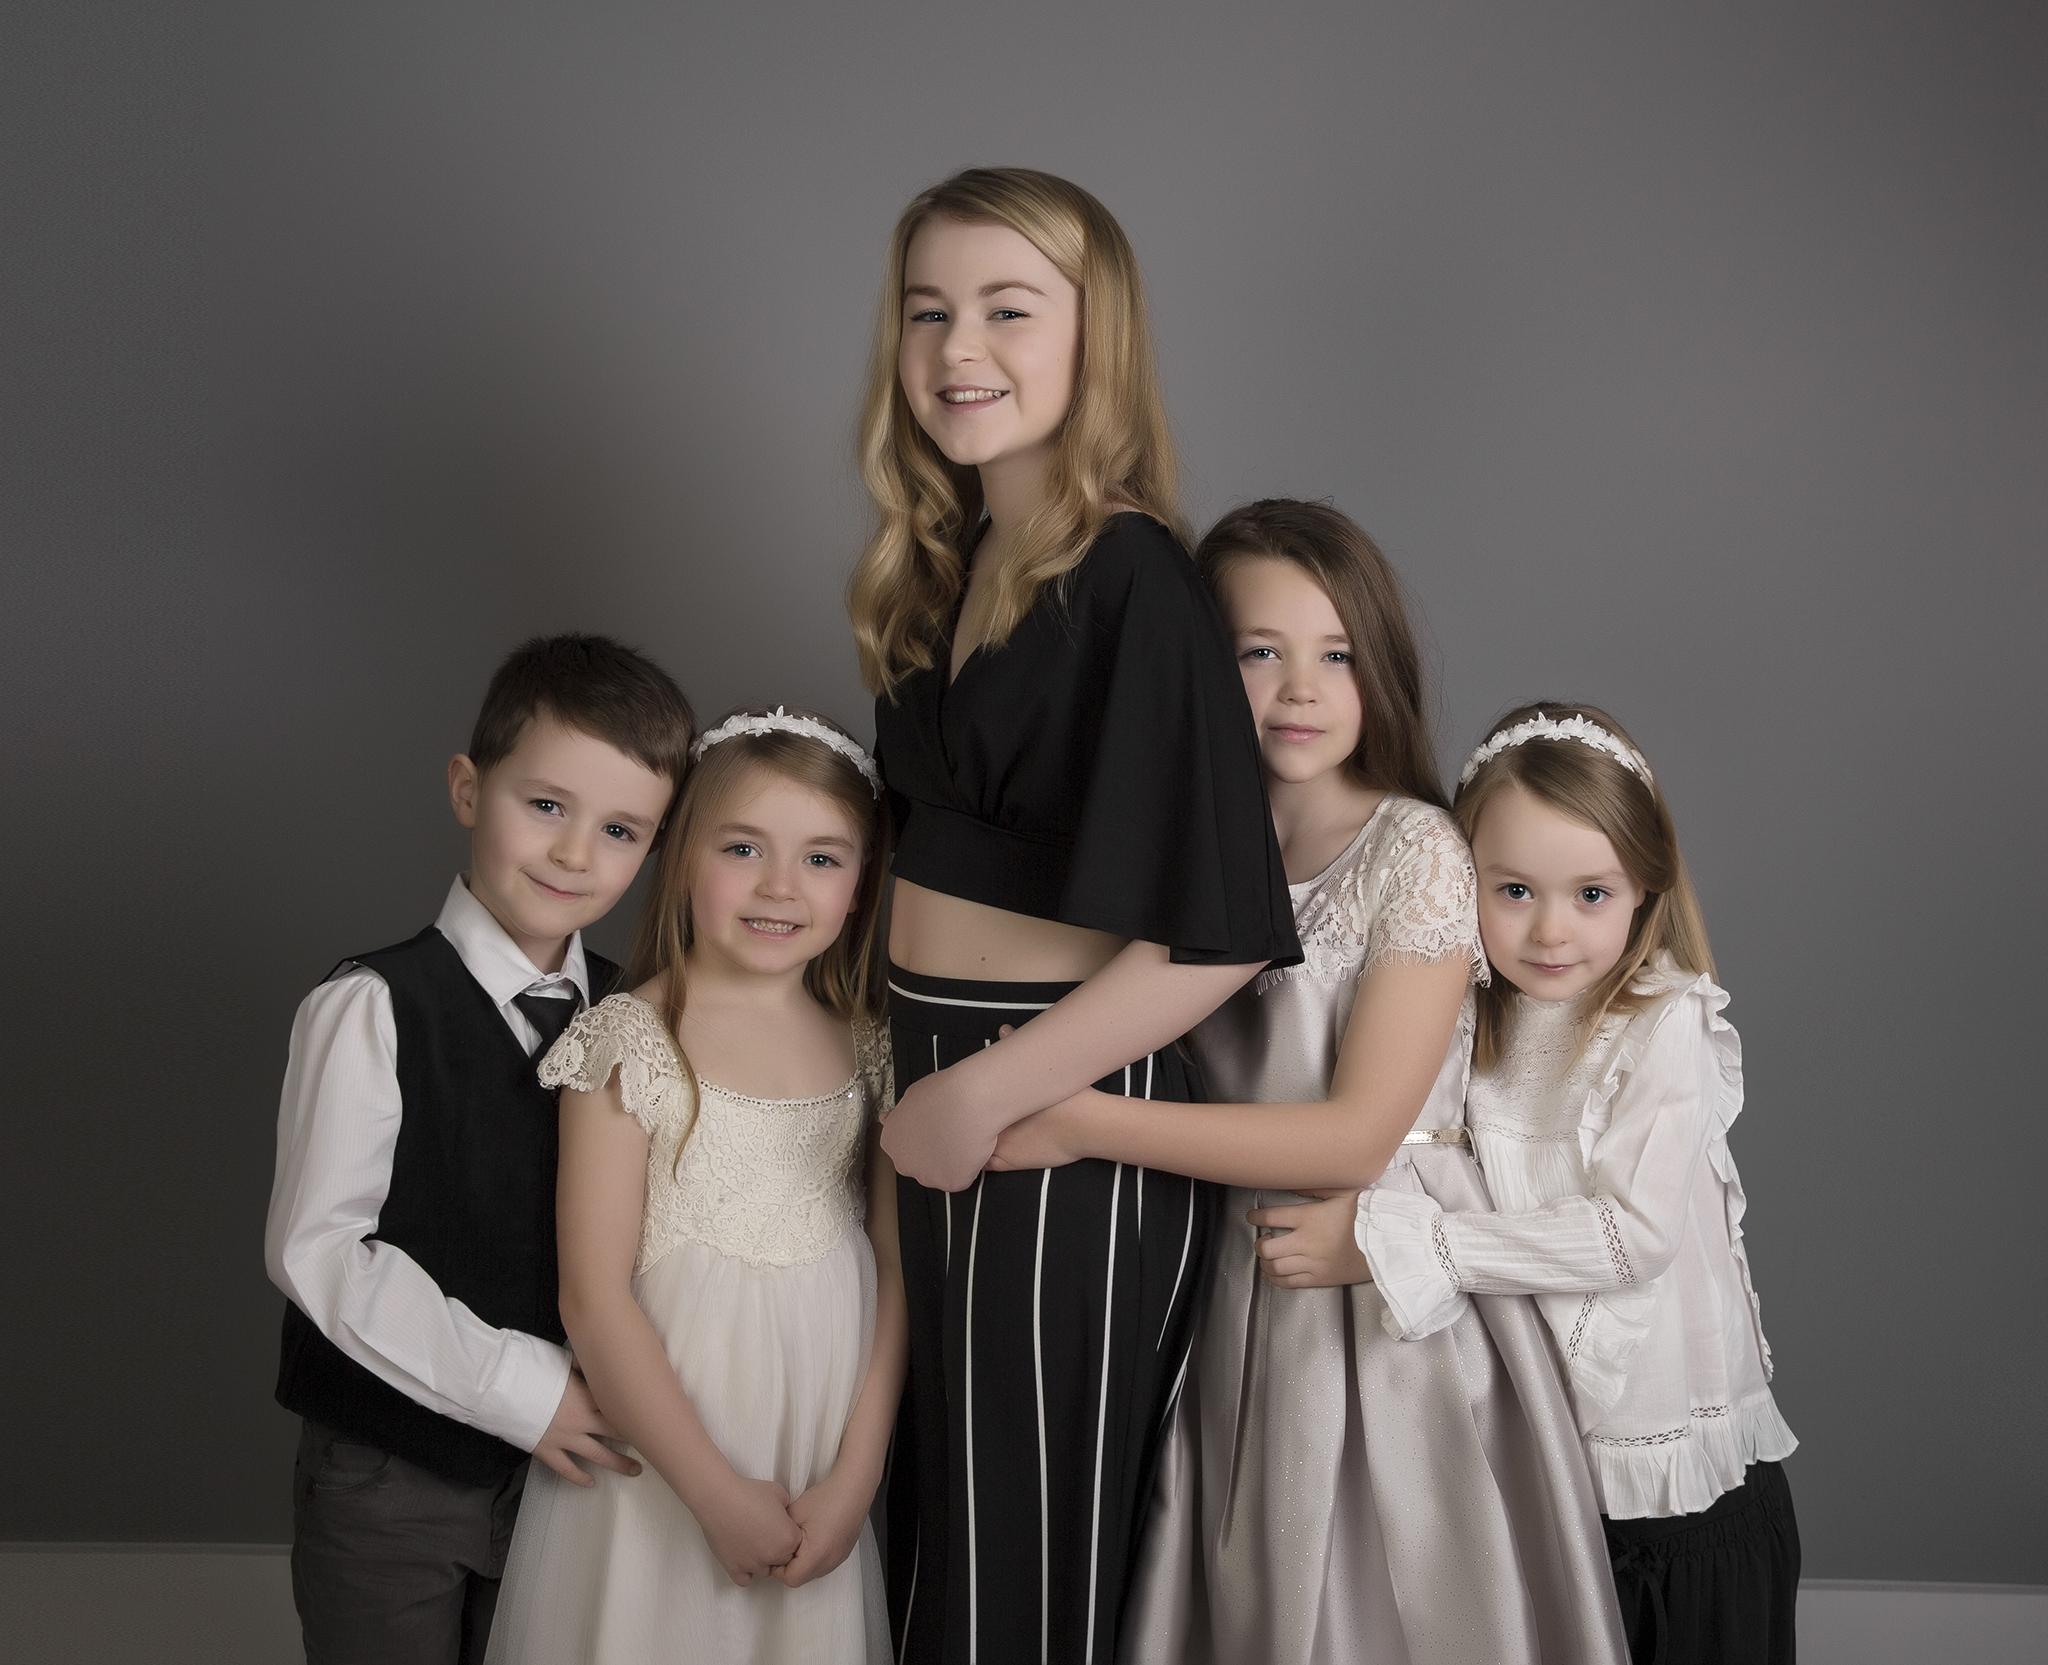 elizabethg_photography_hertfordshire_fineart_photographer_family_overhead_02.jpg